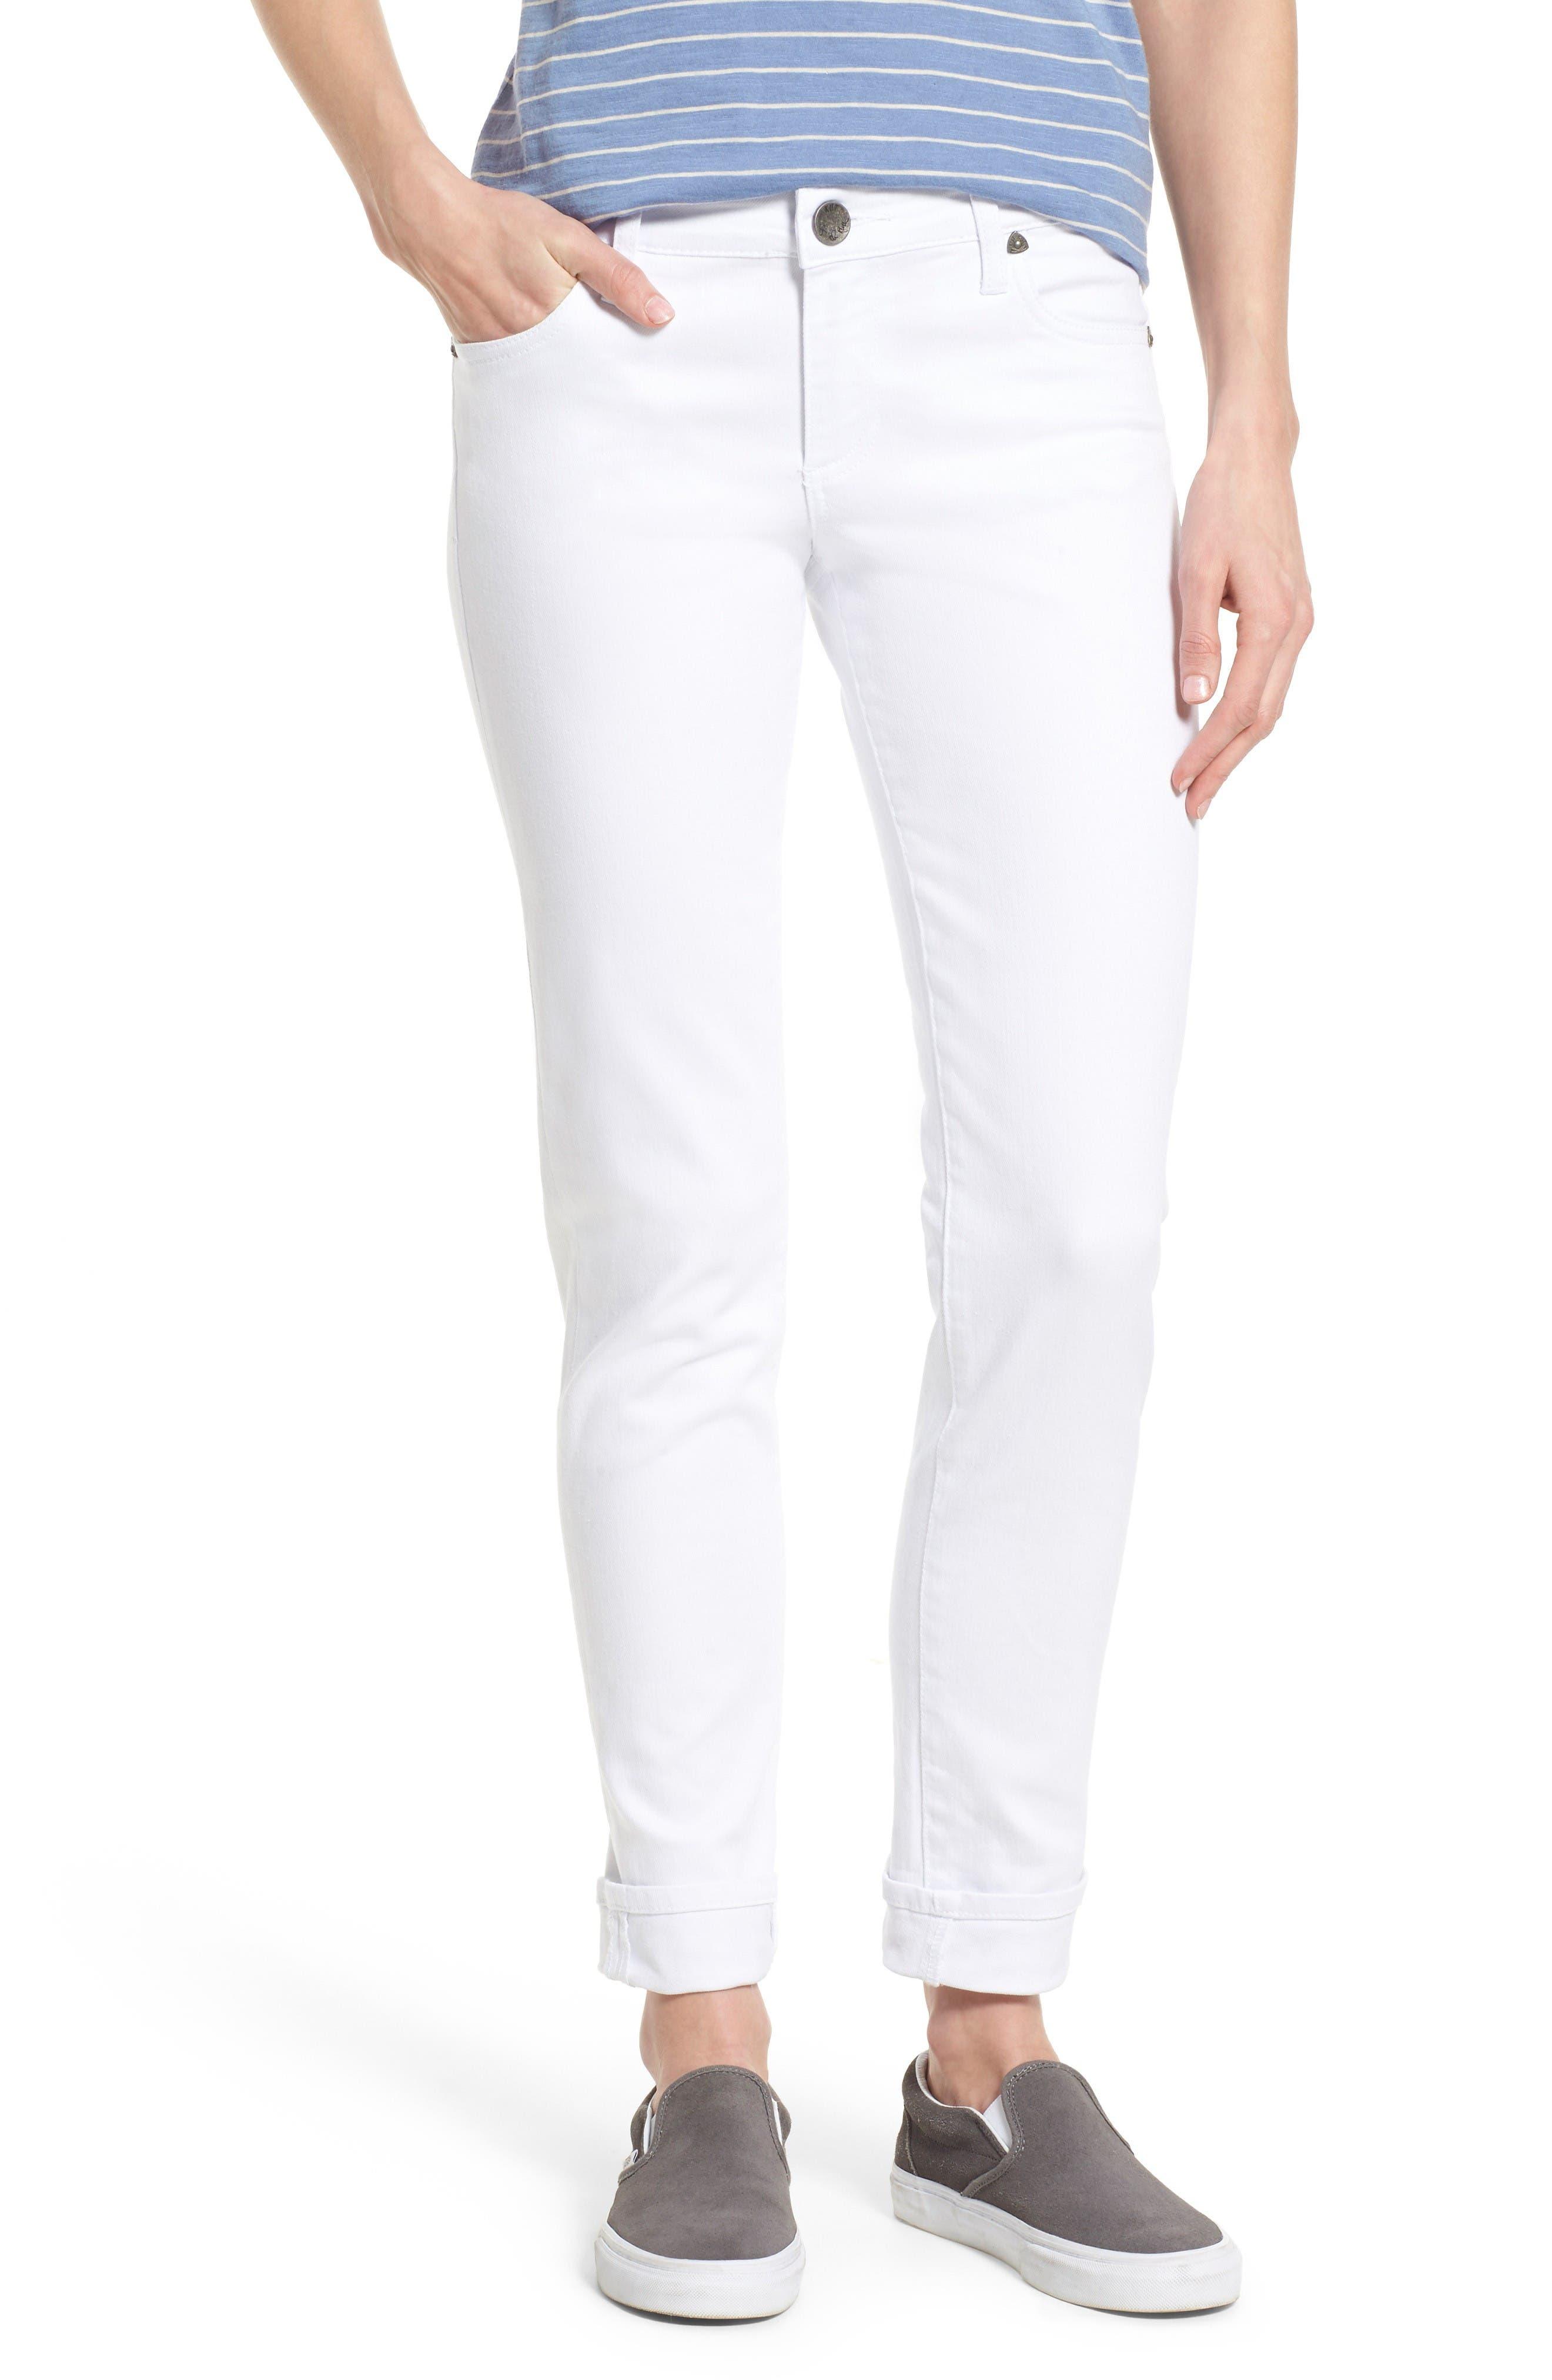 Catherine Stretch Boyfriend Jeans,                             Main thumbnail 1, color,                             White